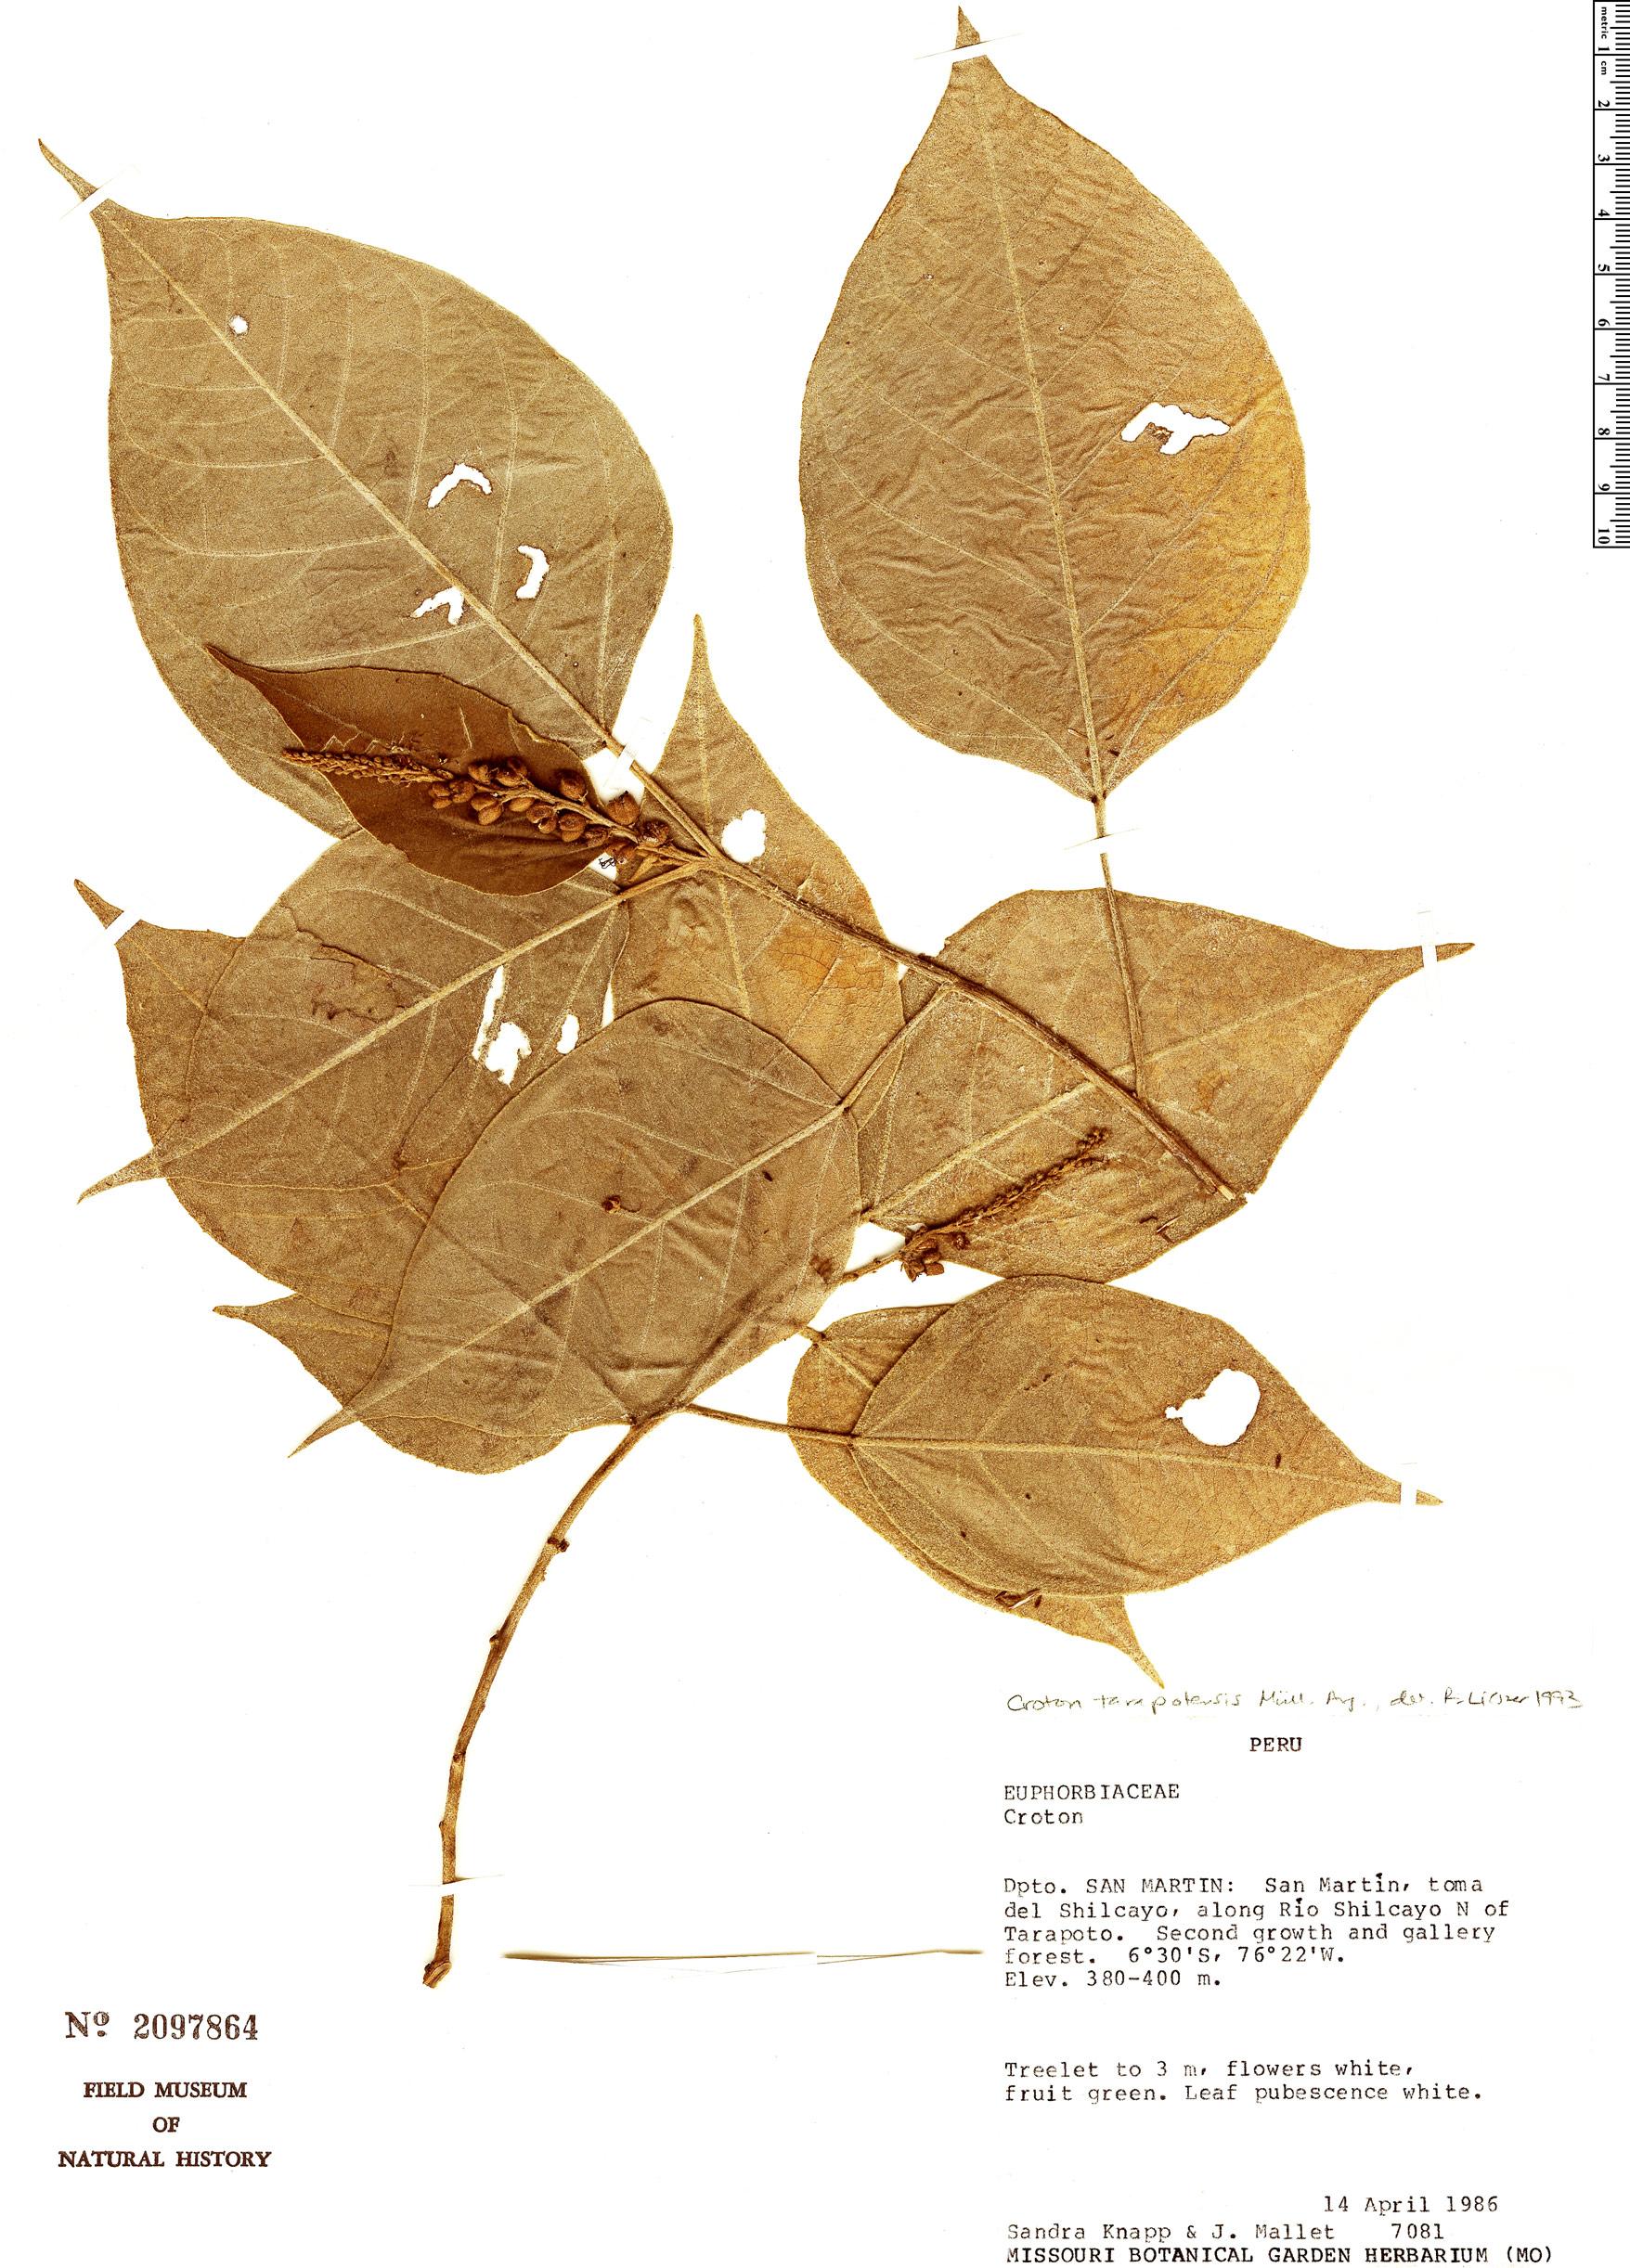 Croton tarapotensis image